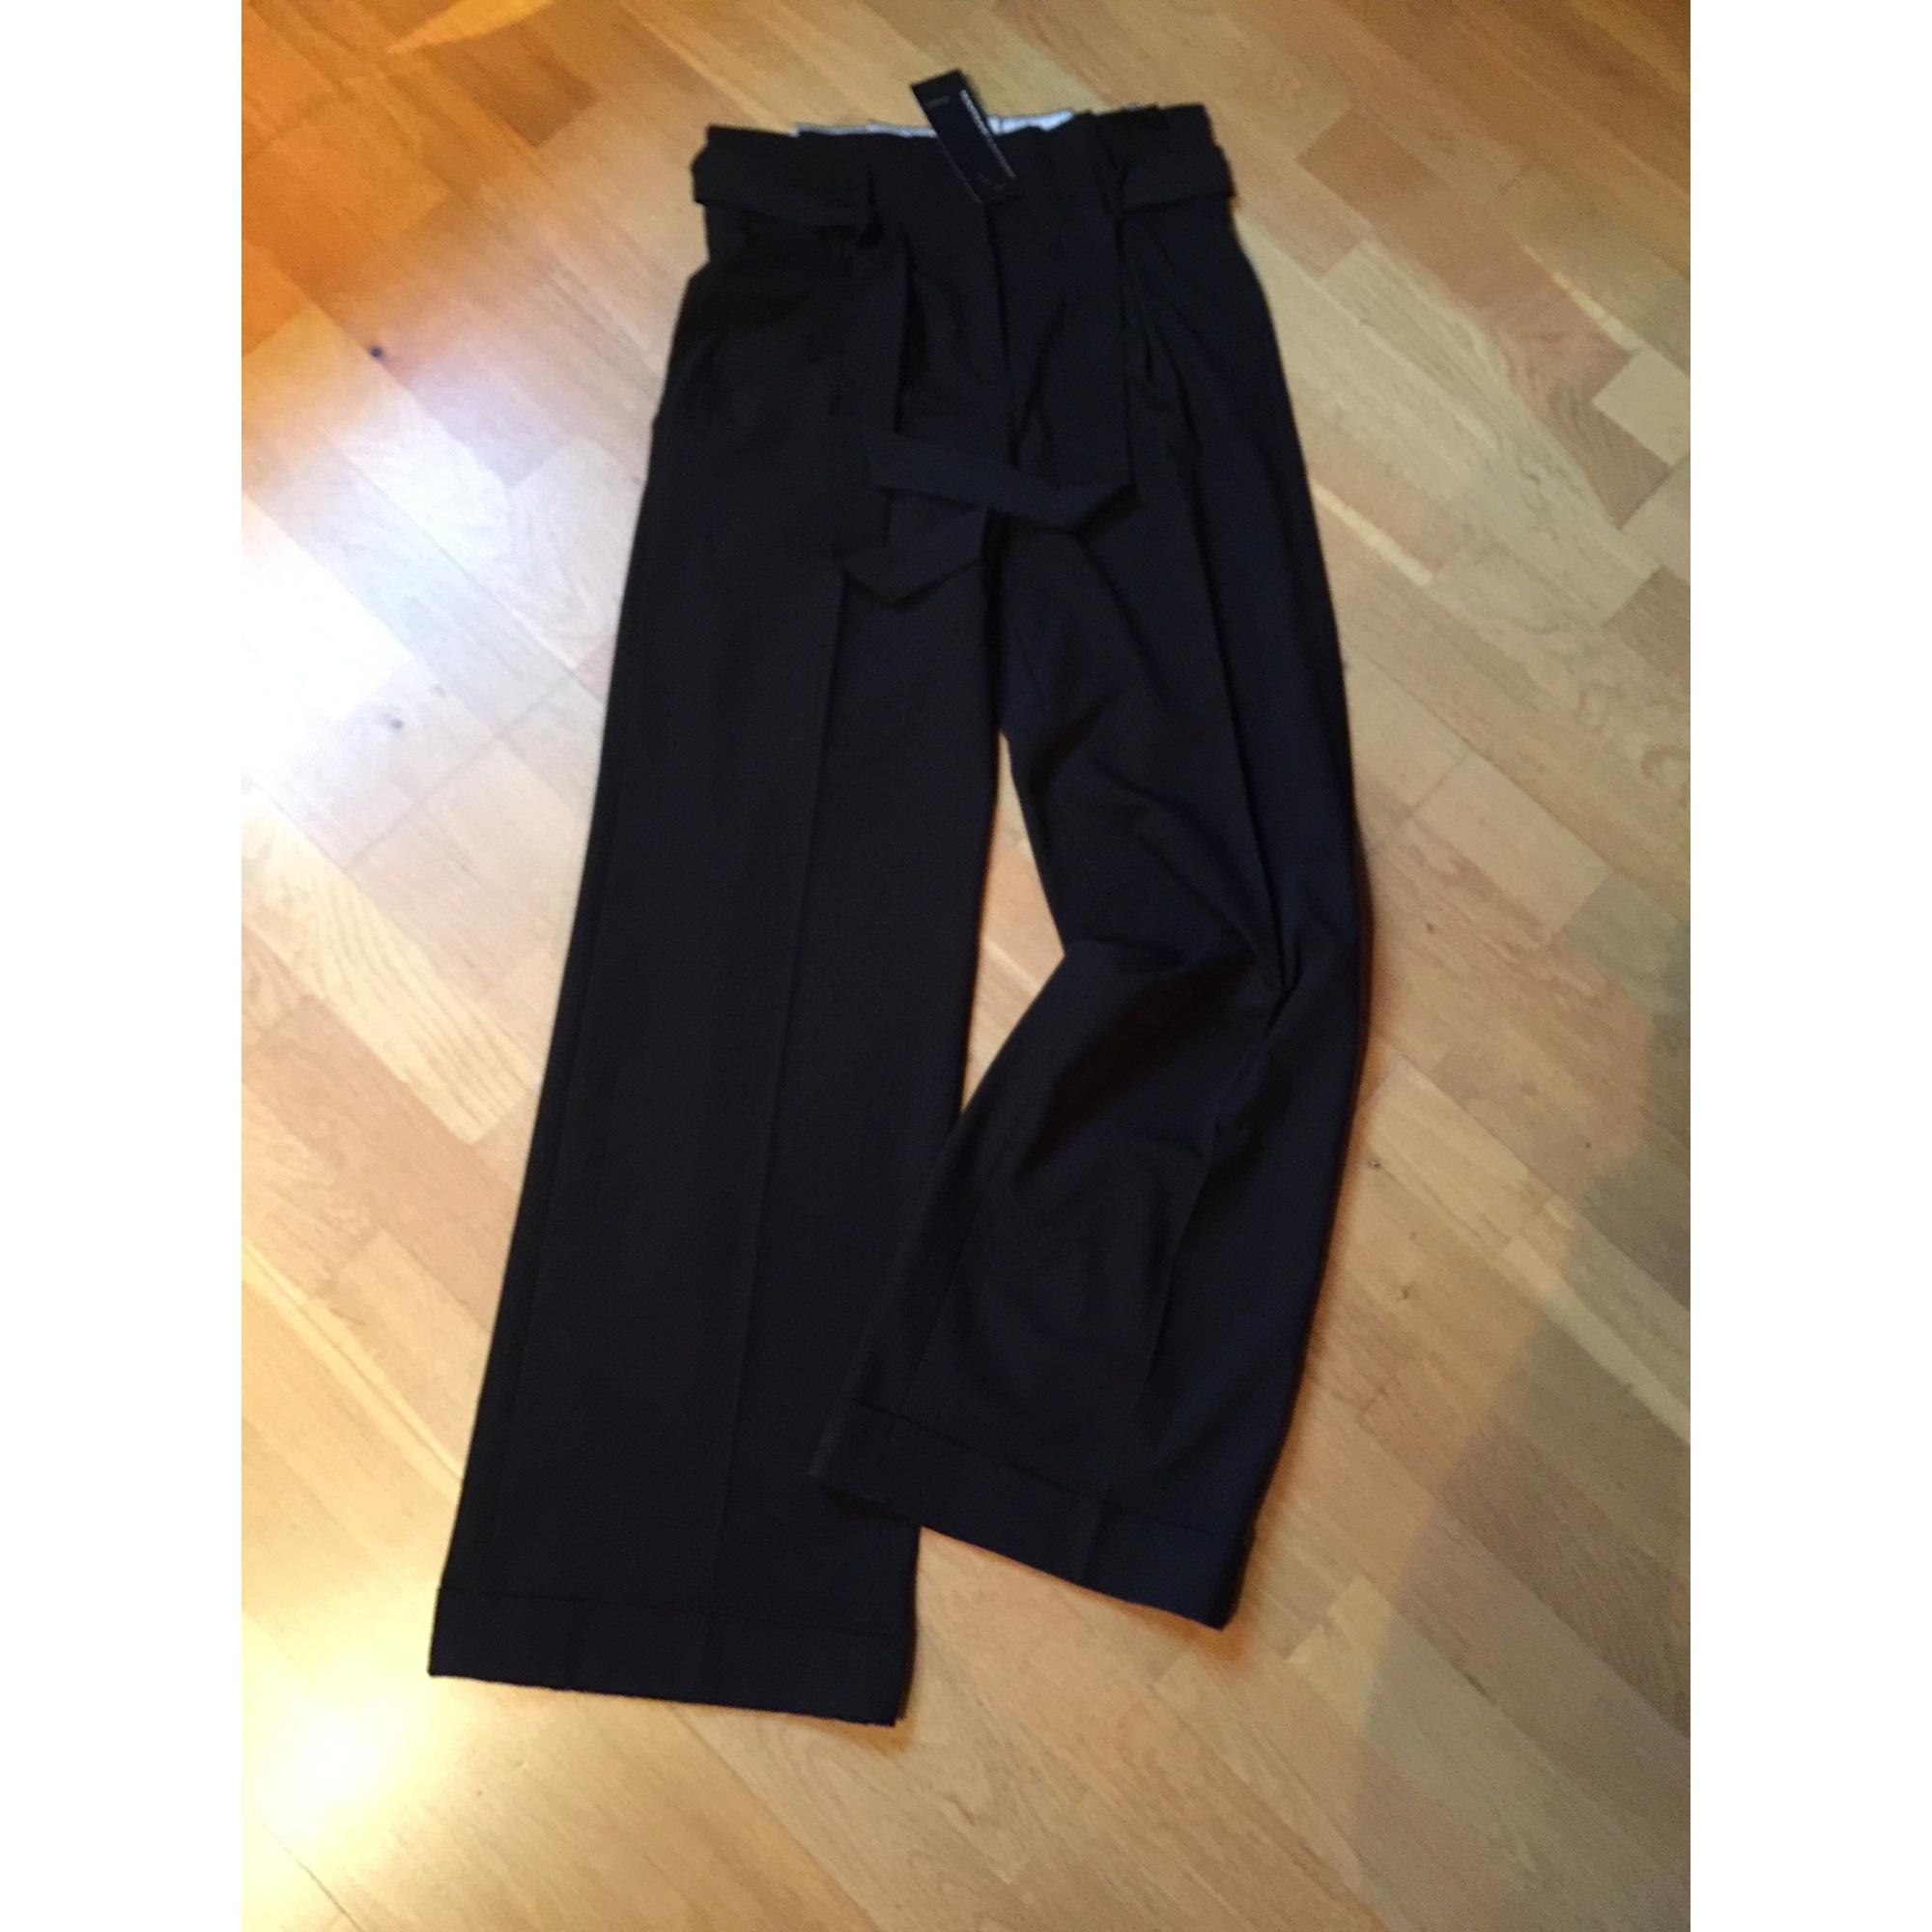 Pantalon Large Naf Naf 36 S T1 Noir Vendu Par Malingre 8273596